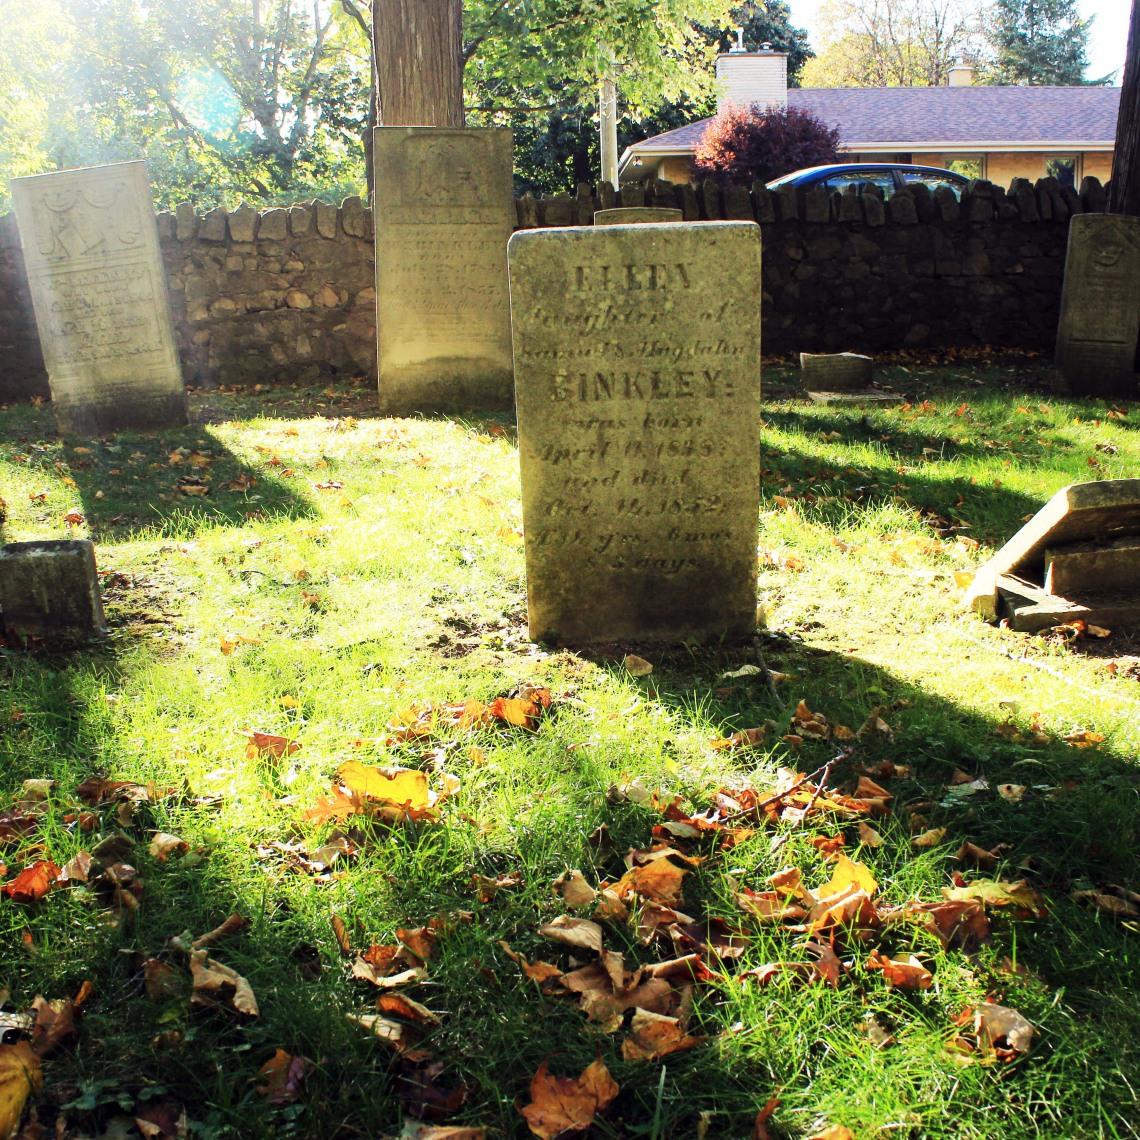 Binkley Hallow 1854 Cemetery, Hamilton (Ont) Photo by @erskinec